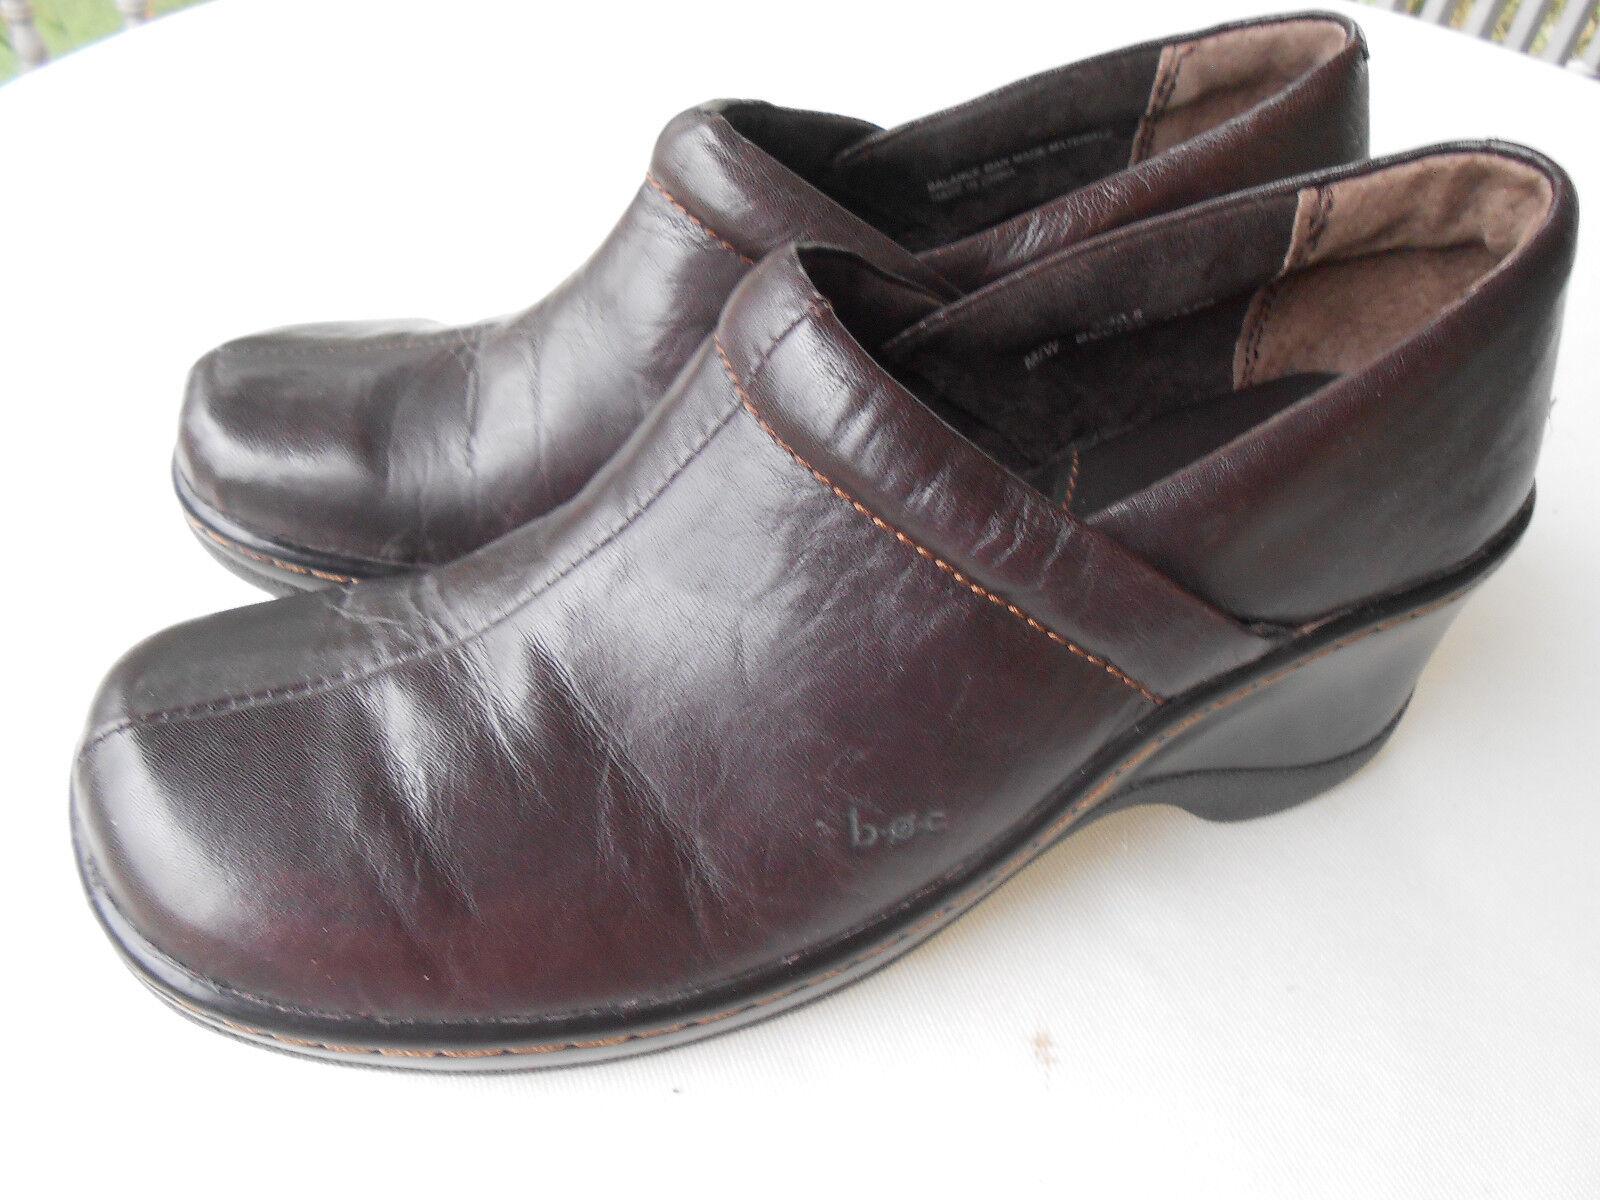 BOC brown Born Concepts women's professional brown BOC leather clogs 9/40.5  M/W 7f071e